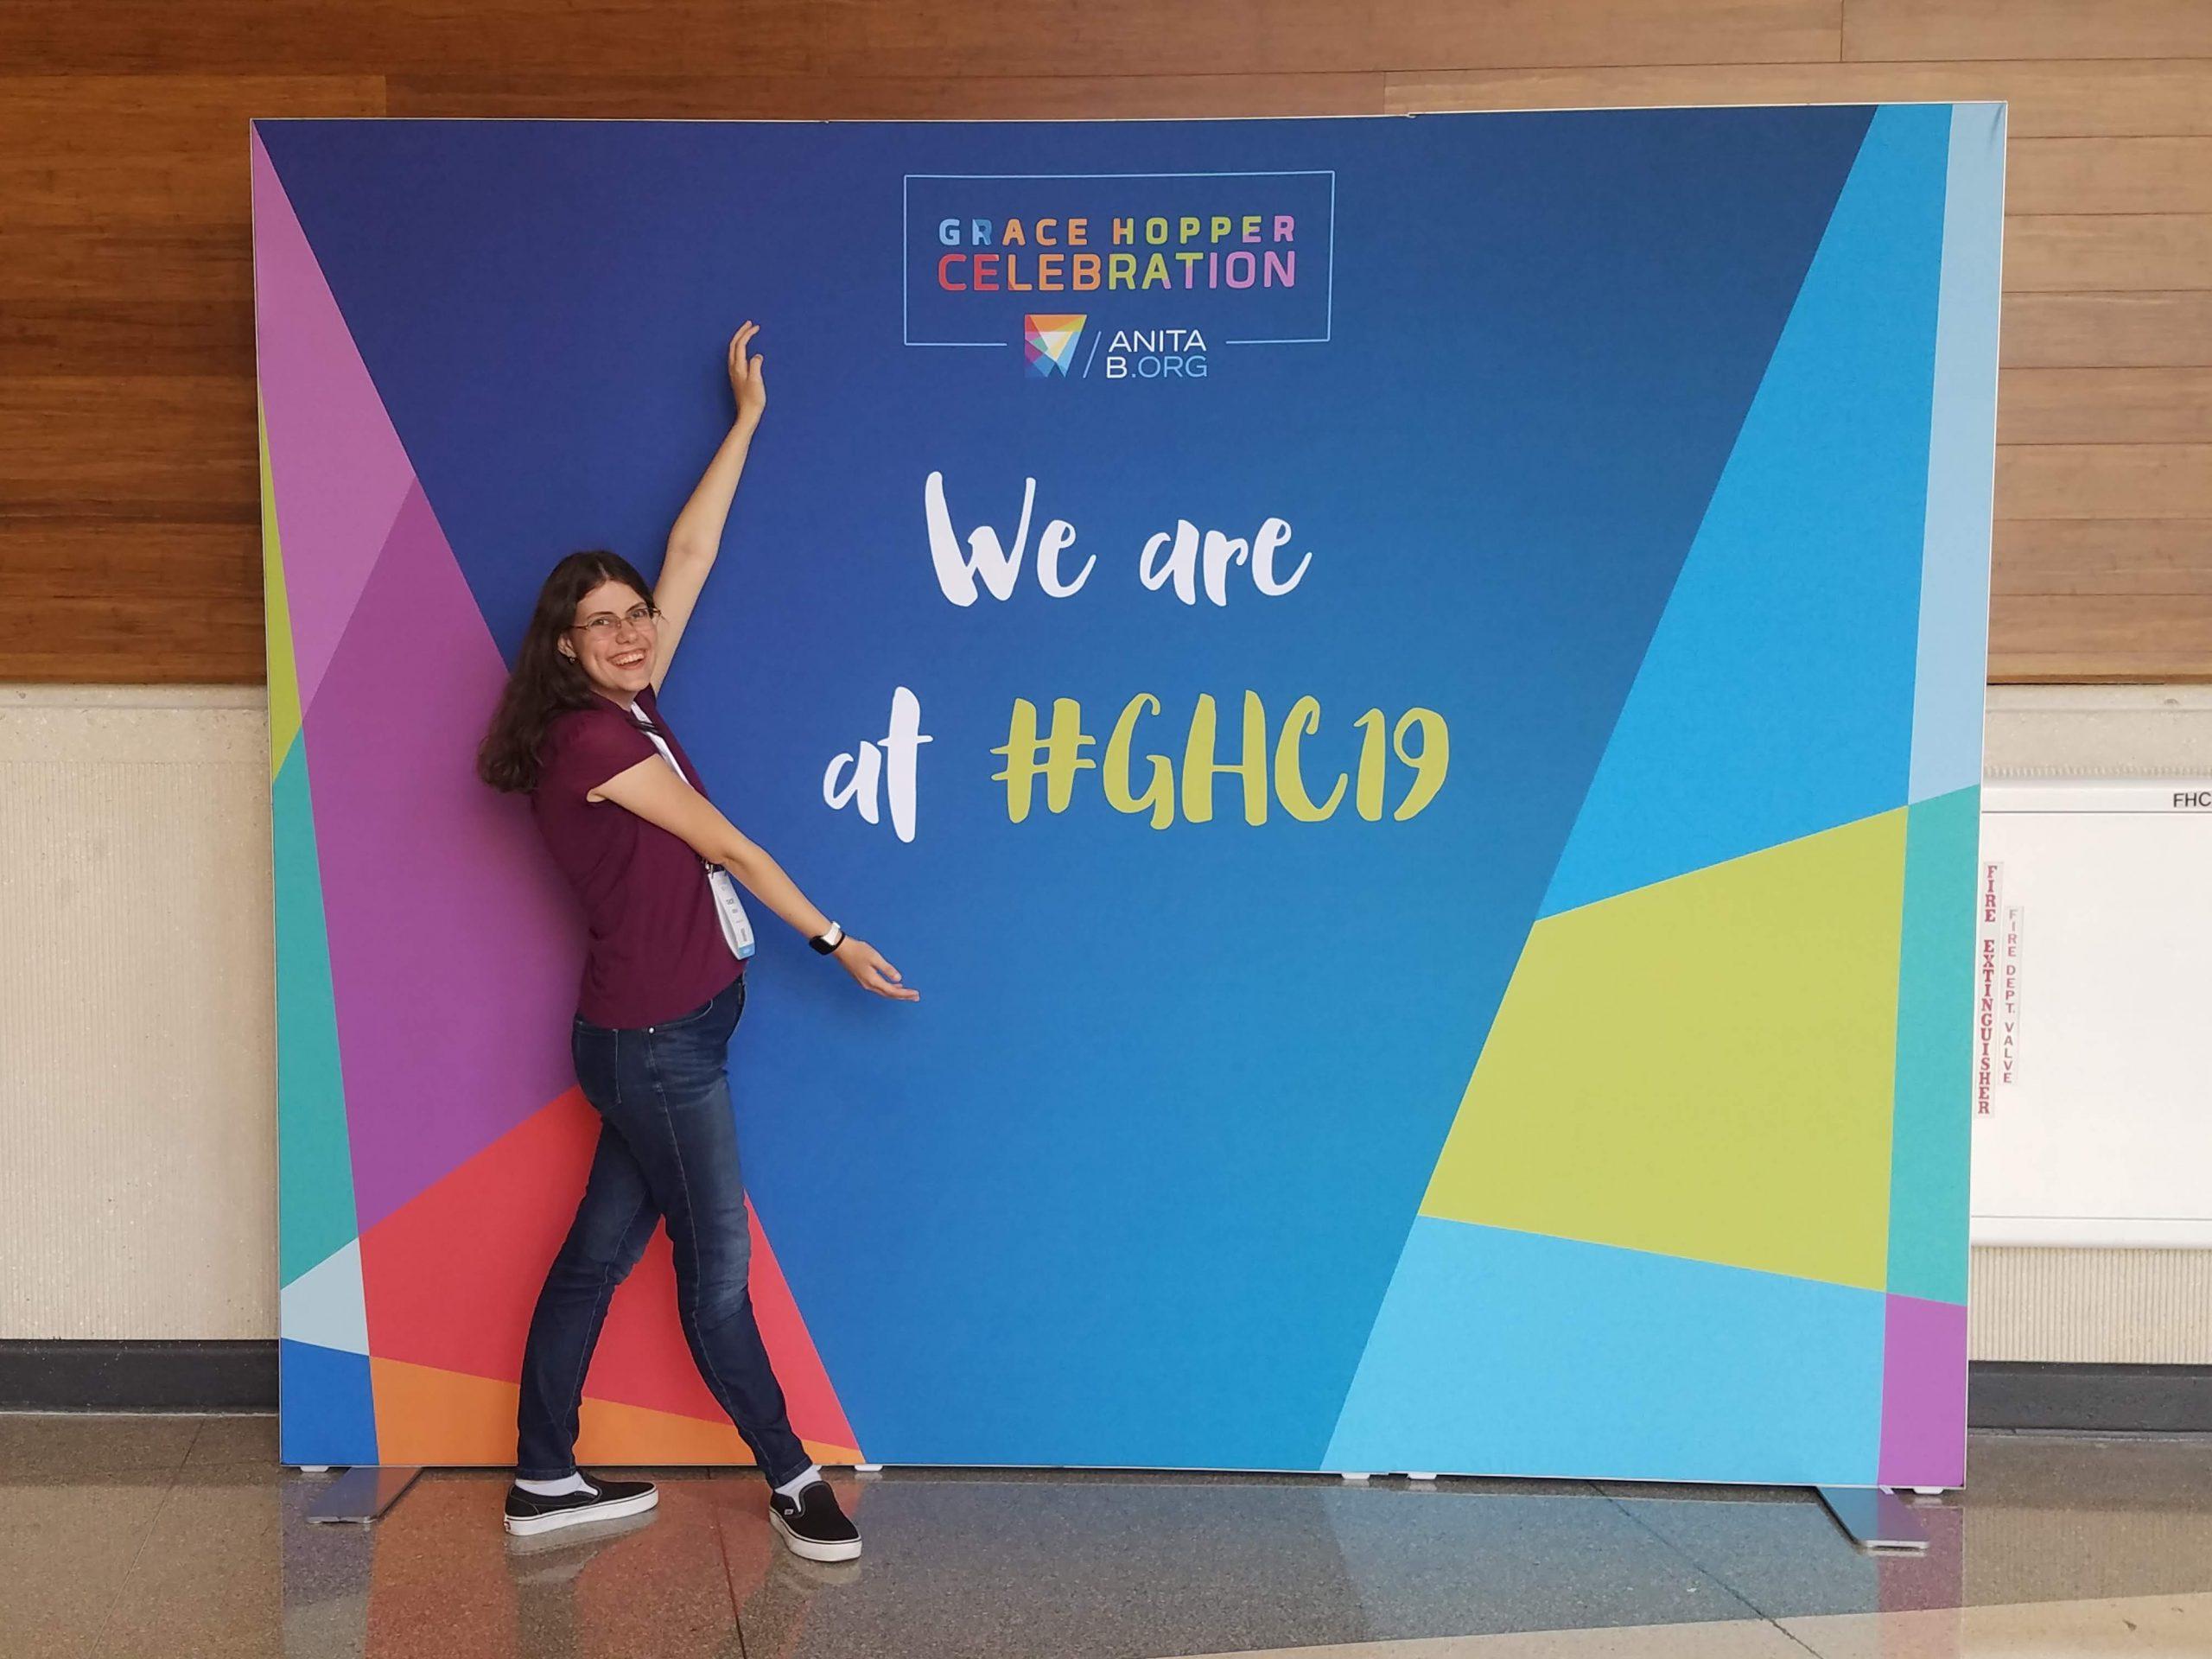 Chloe in front of Grace Hopper sign.